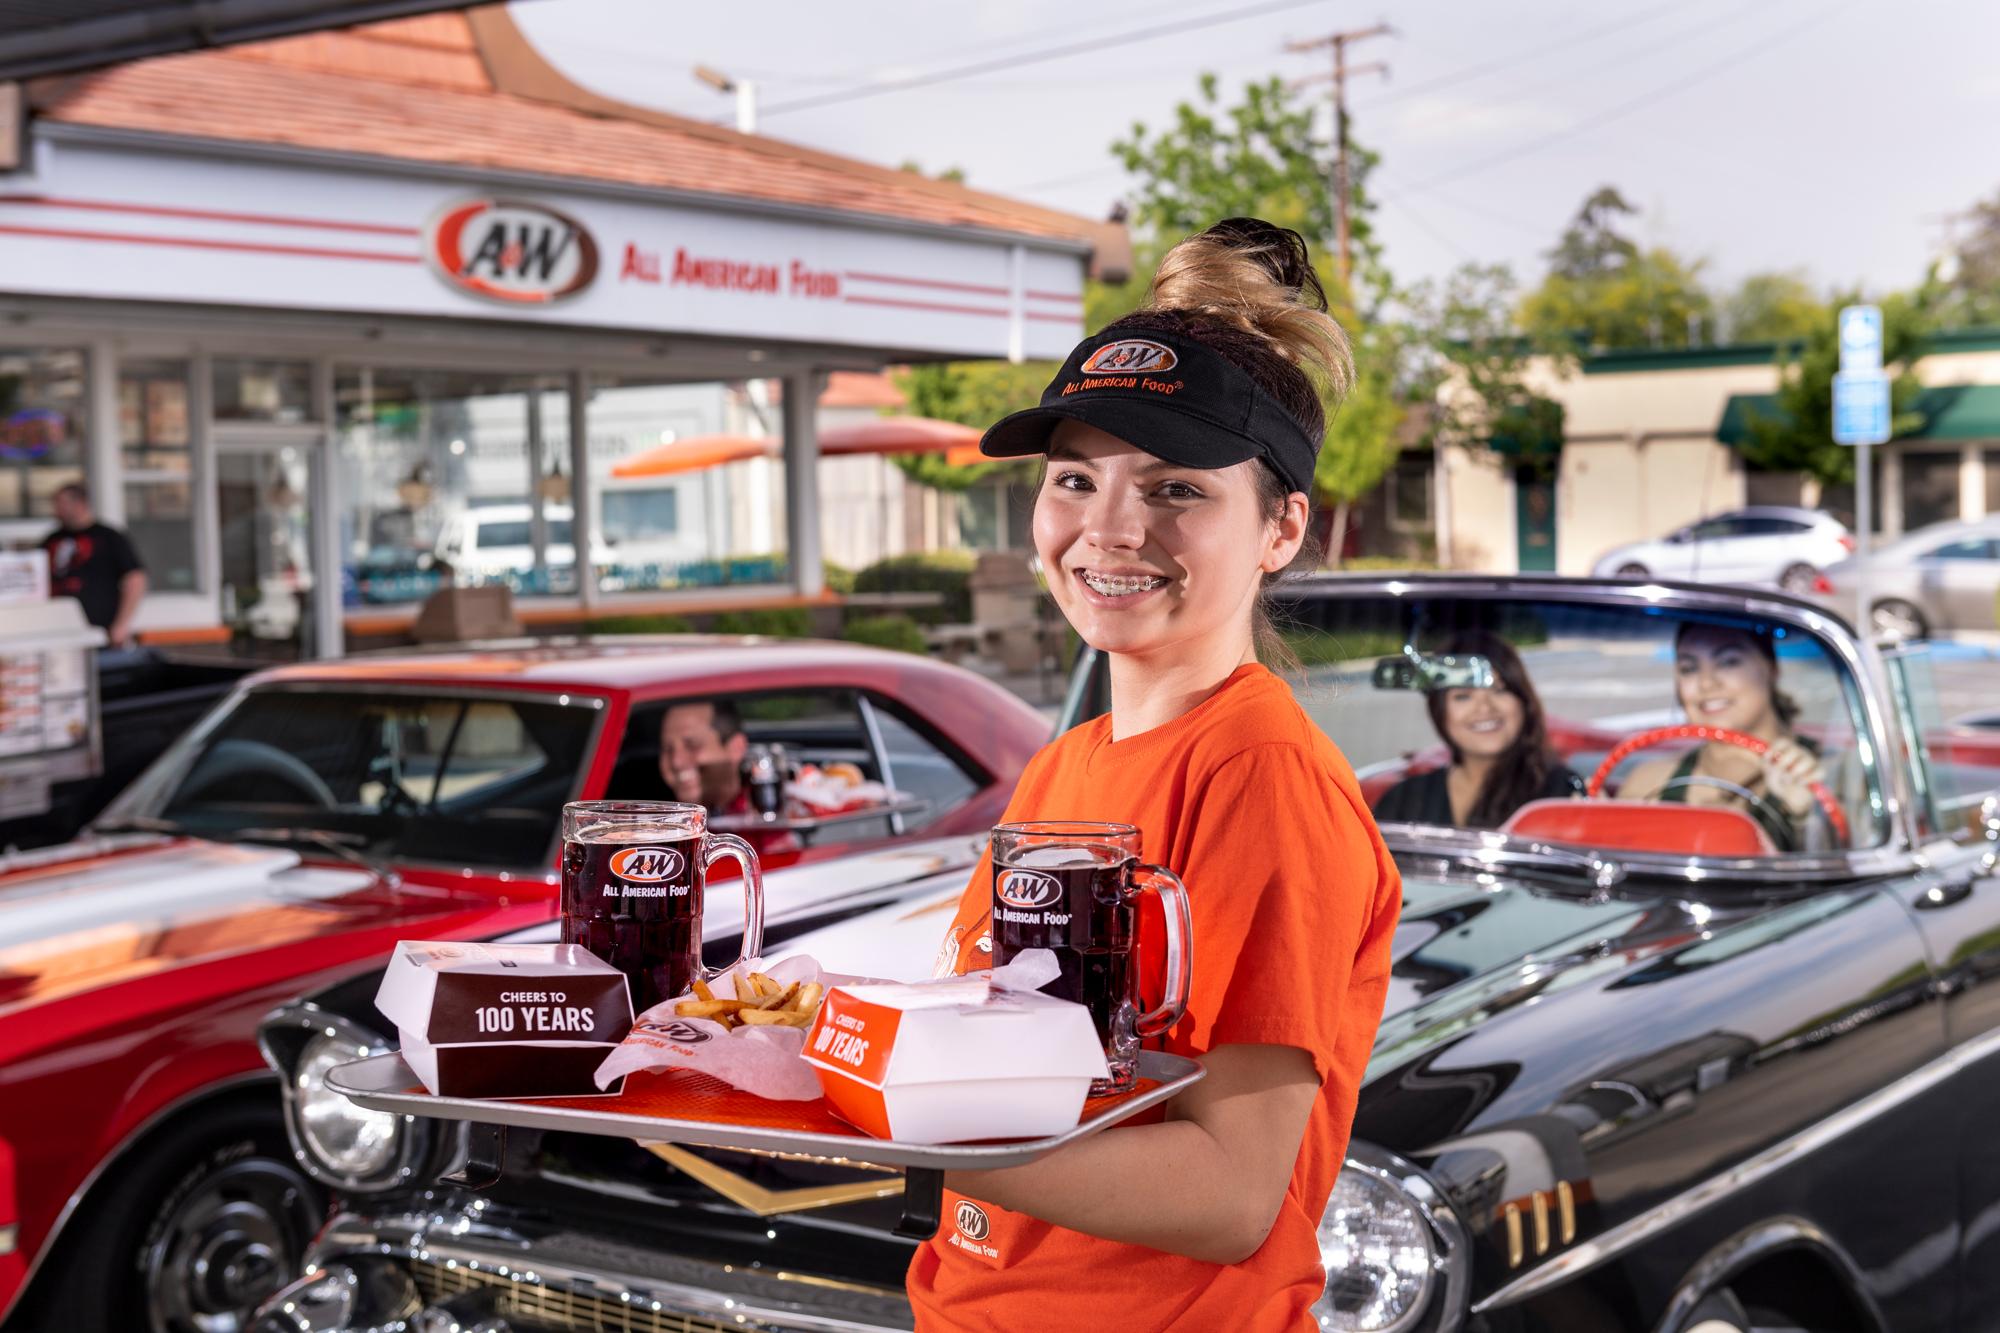 Visalia, CA 2019 Carhop pic by Ron Holman